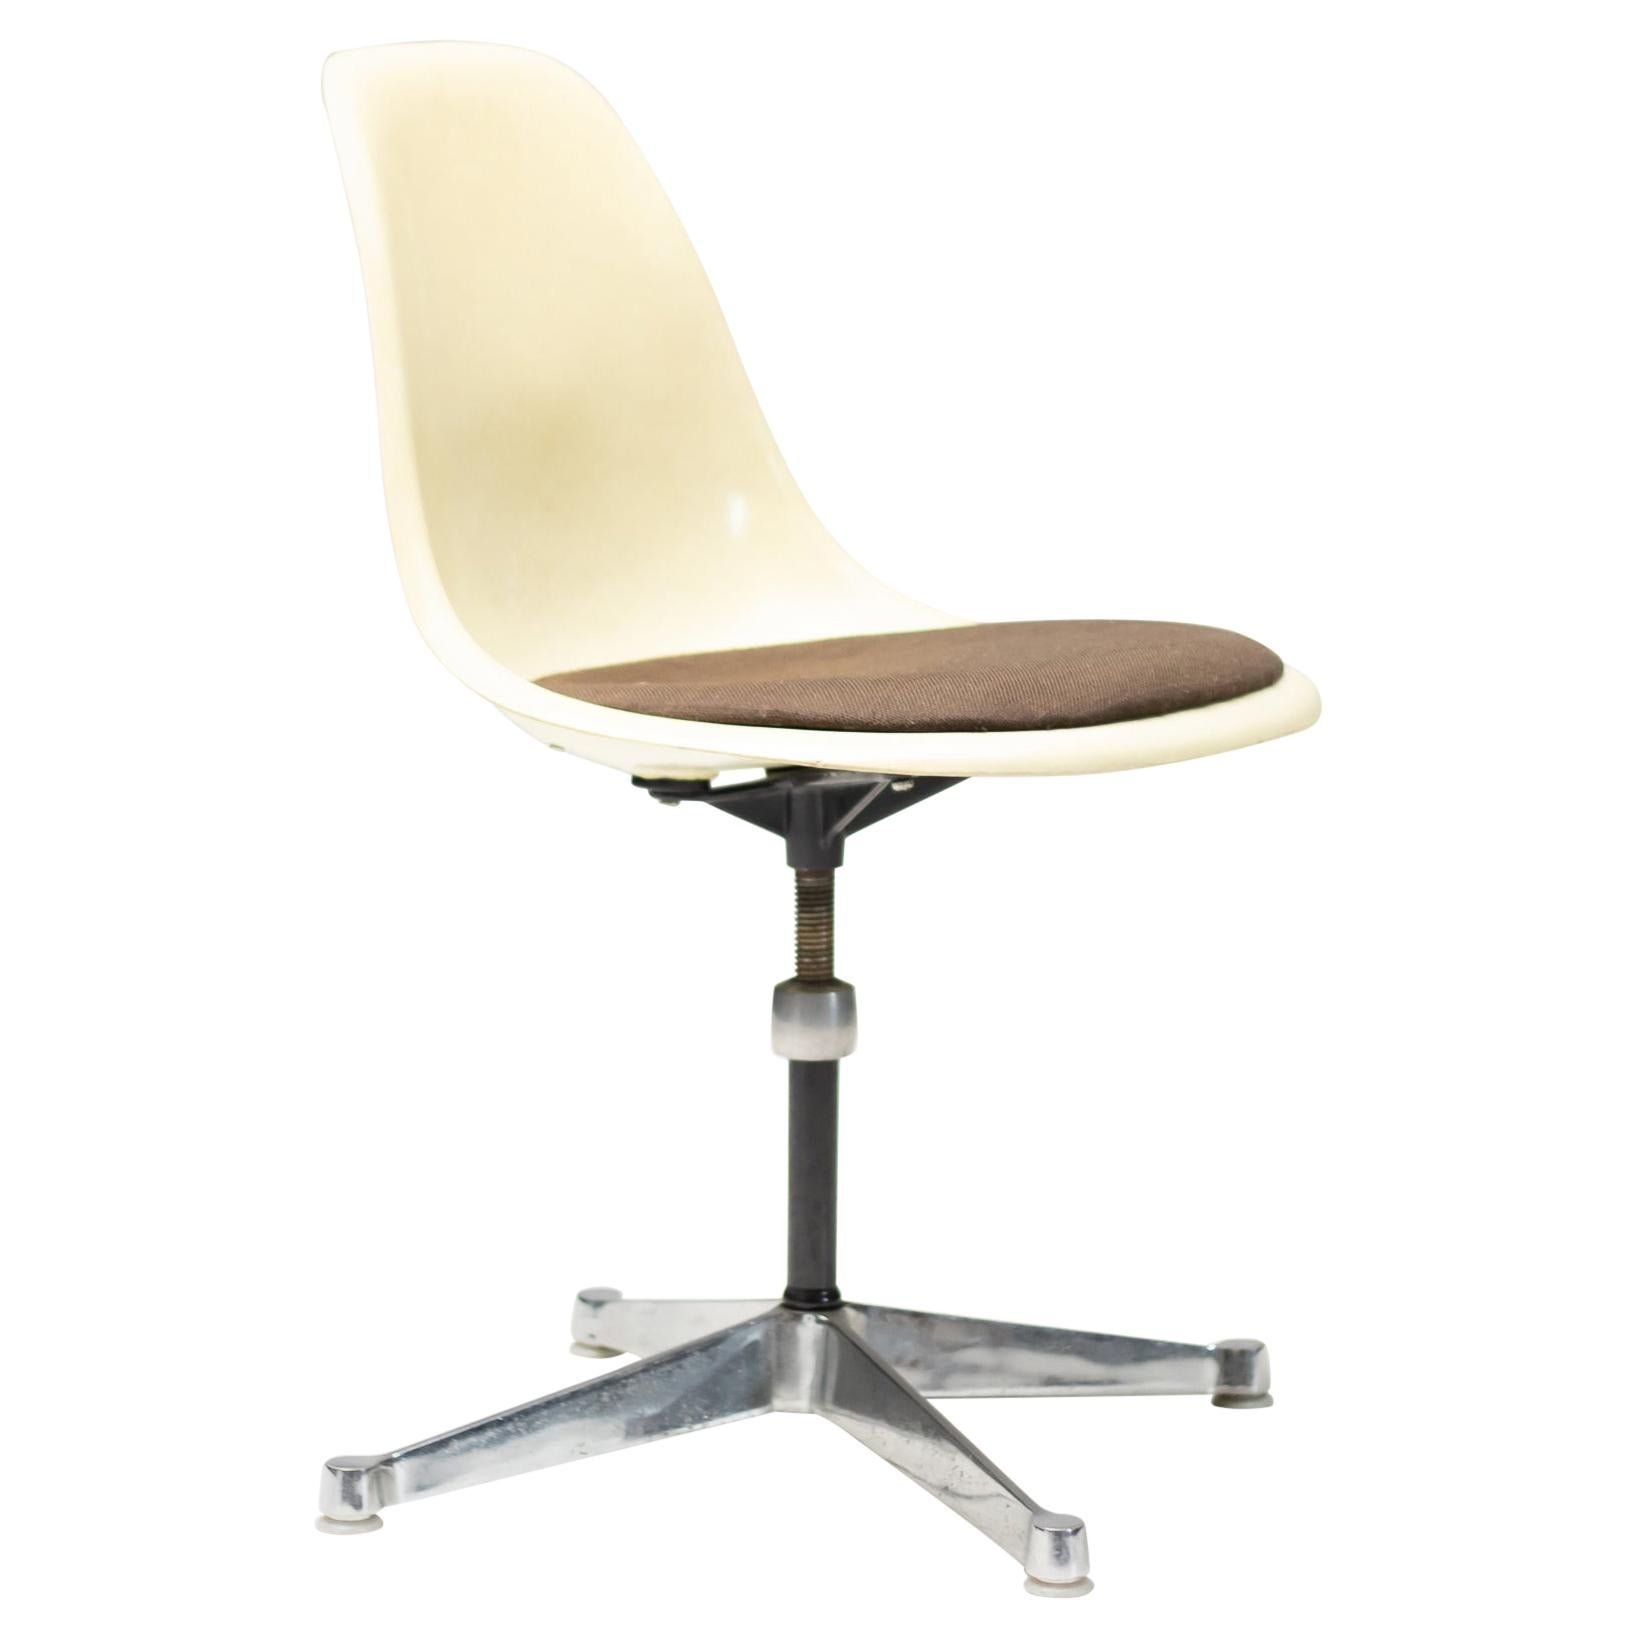 Eames Contract Base Desk Chair